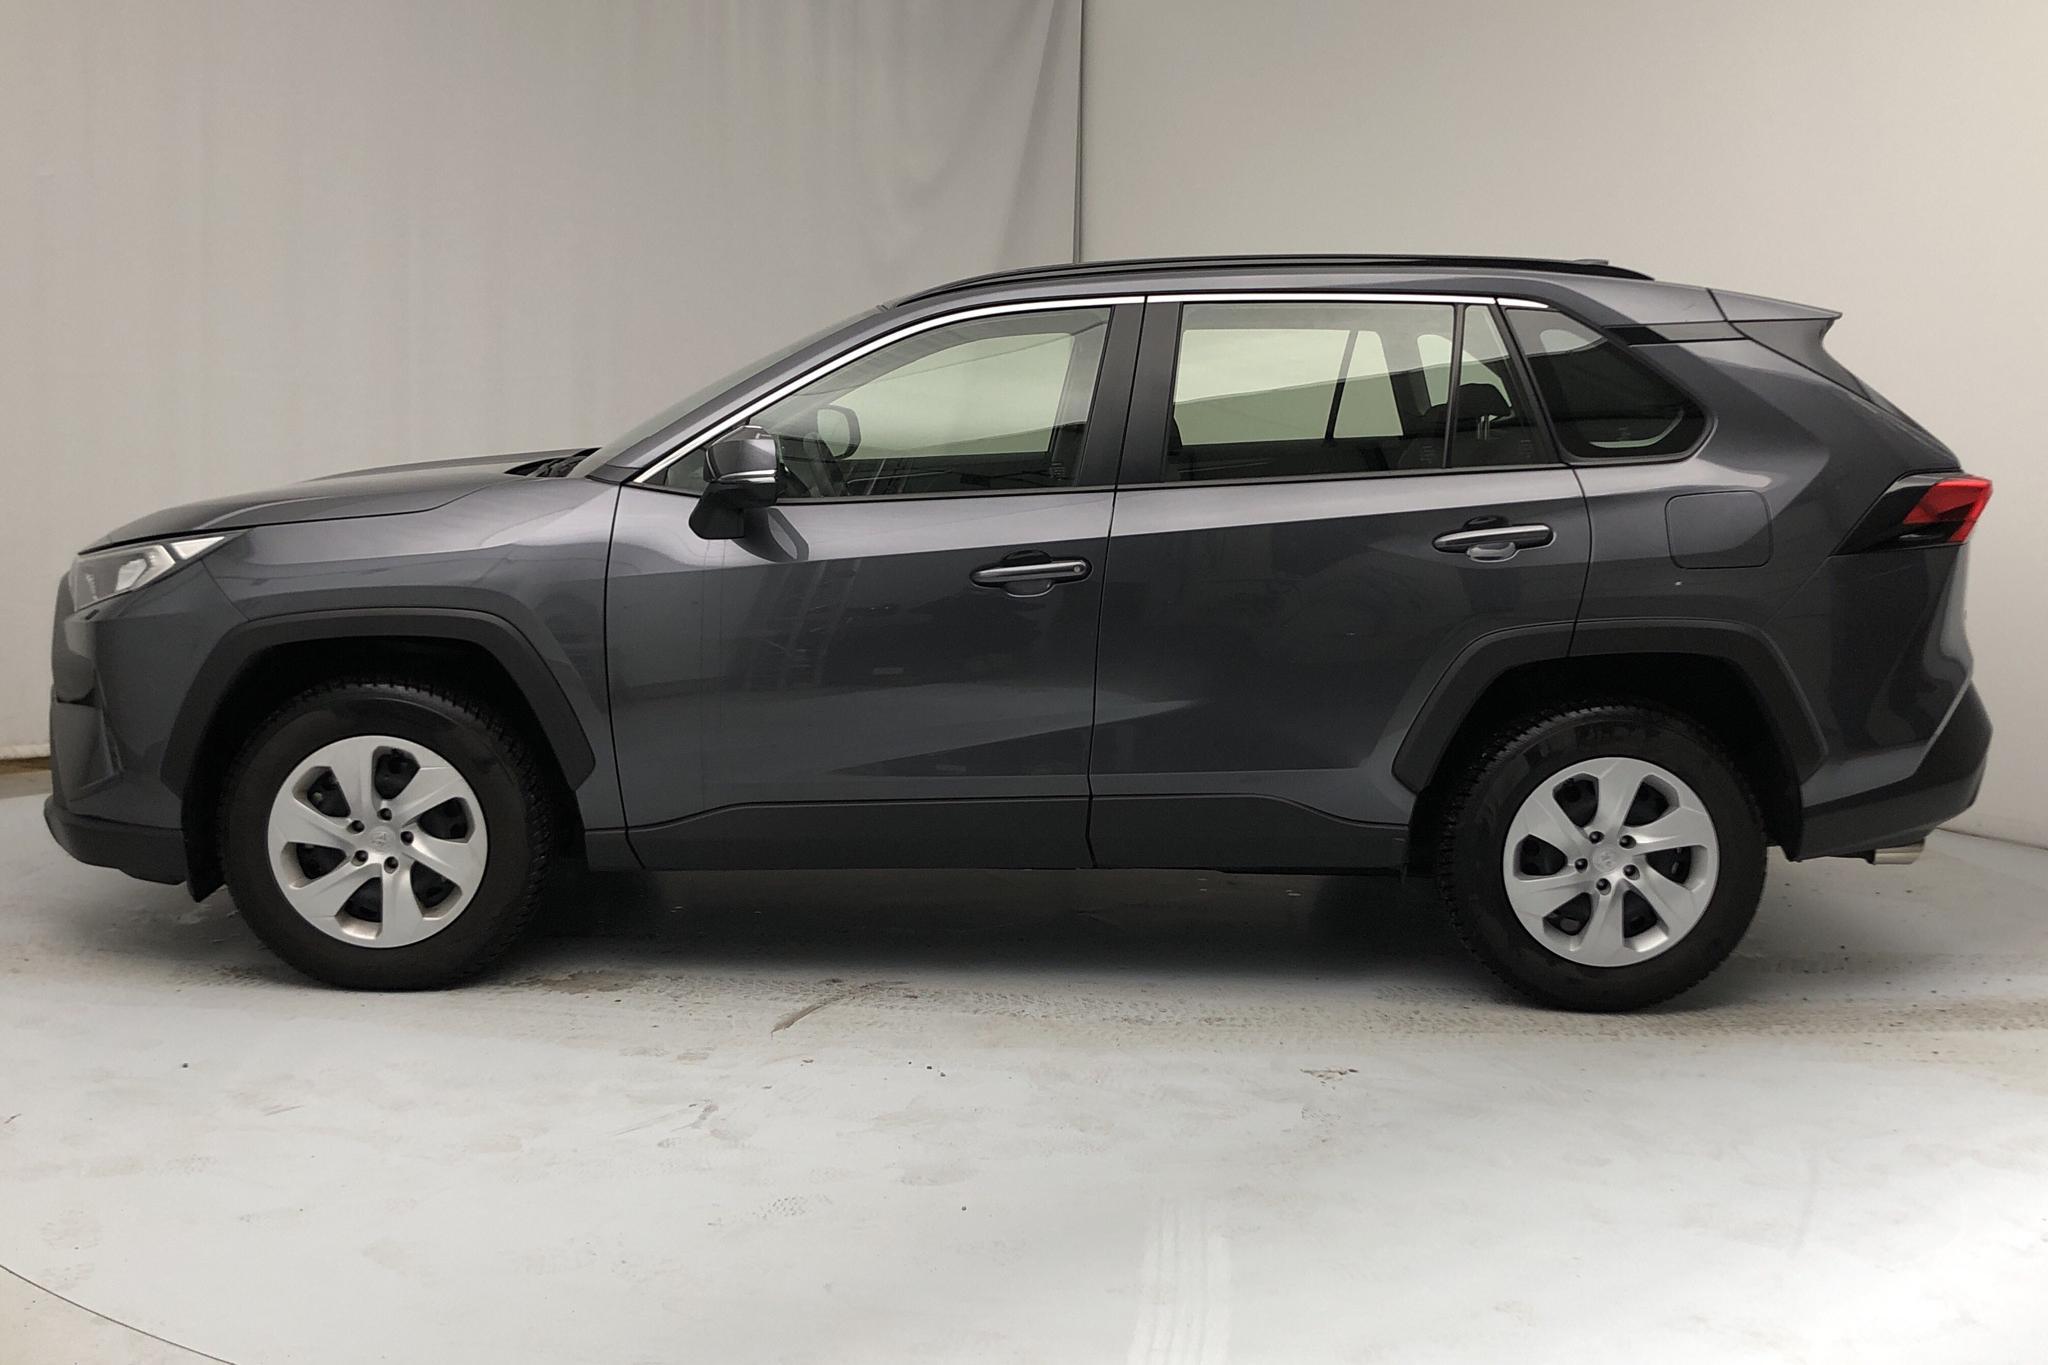 Toyota RAV4 2.0 (175hk) - 19 790 km - Manual - Dark Grey - 2019